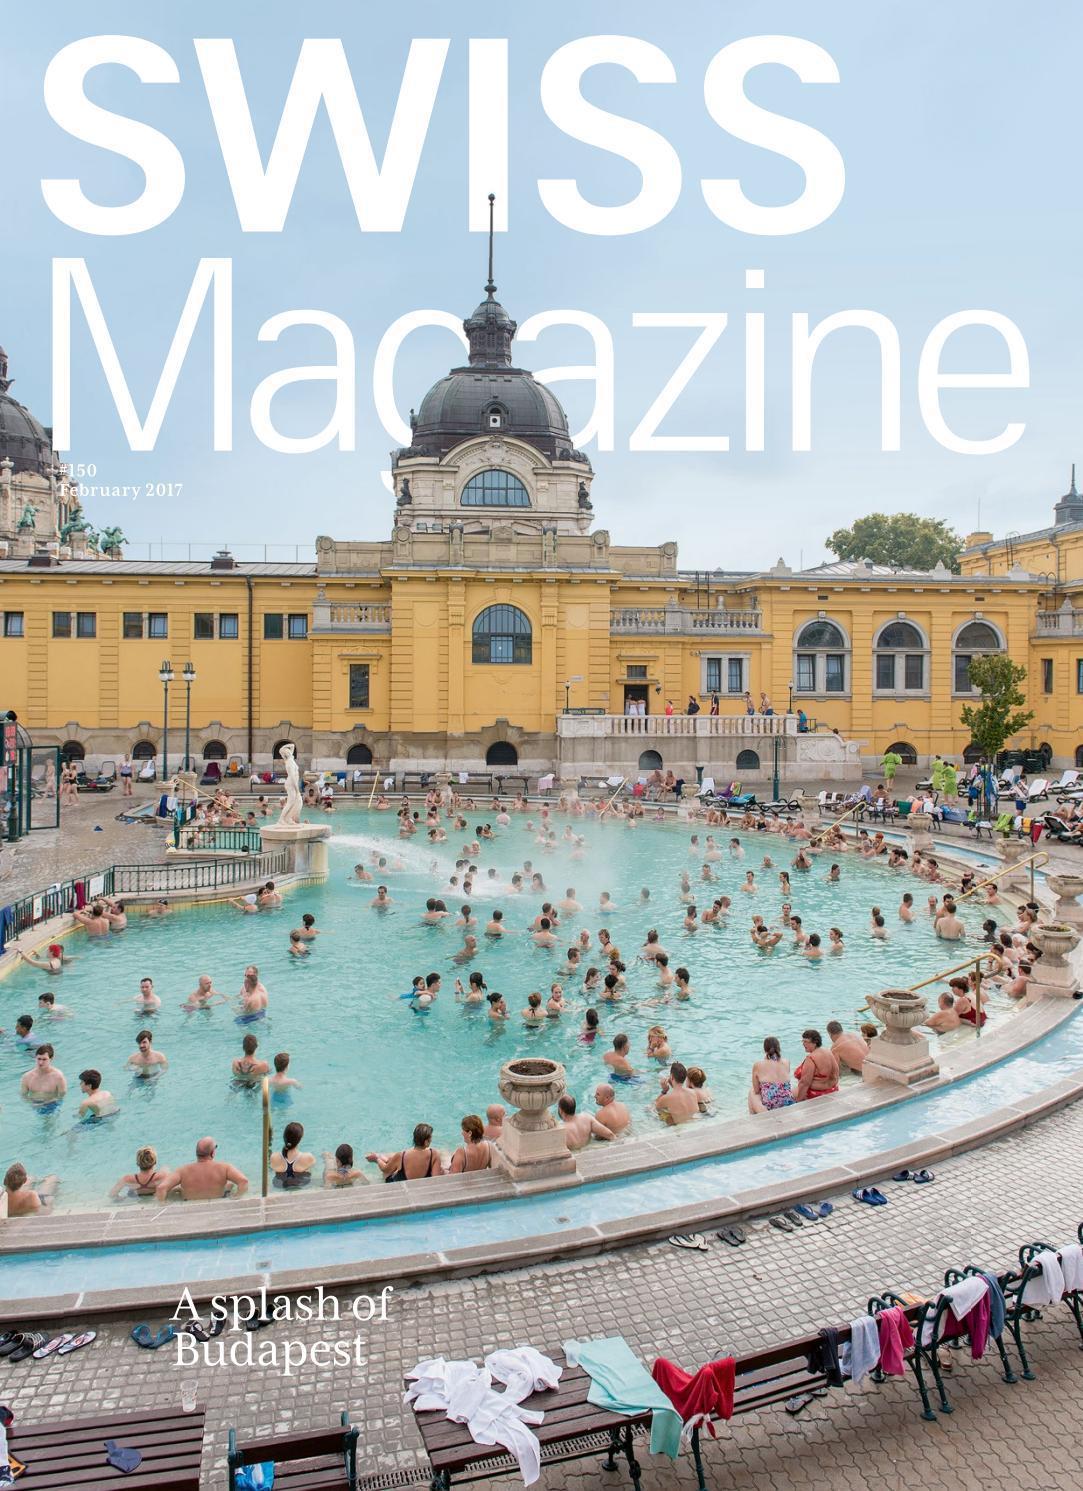 SWISS Magazine February 2017 by SWISS - issuu